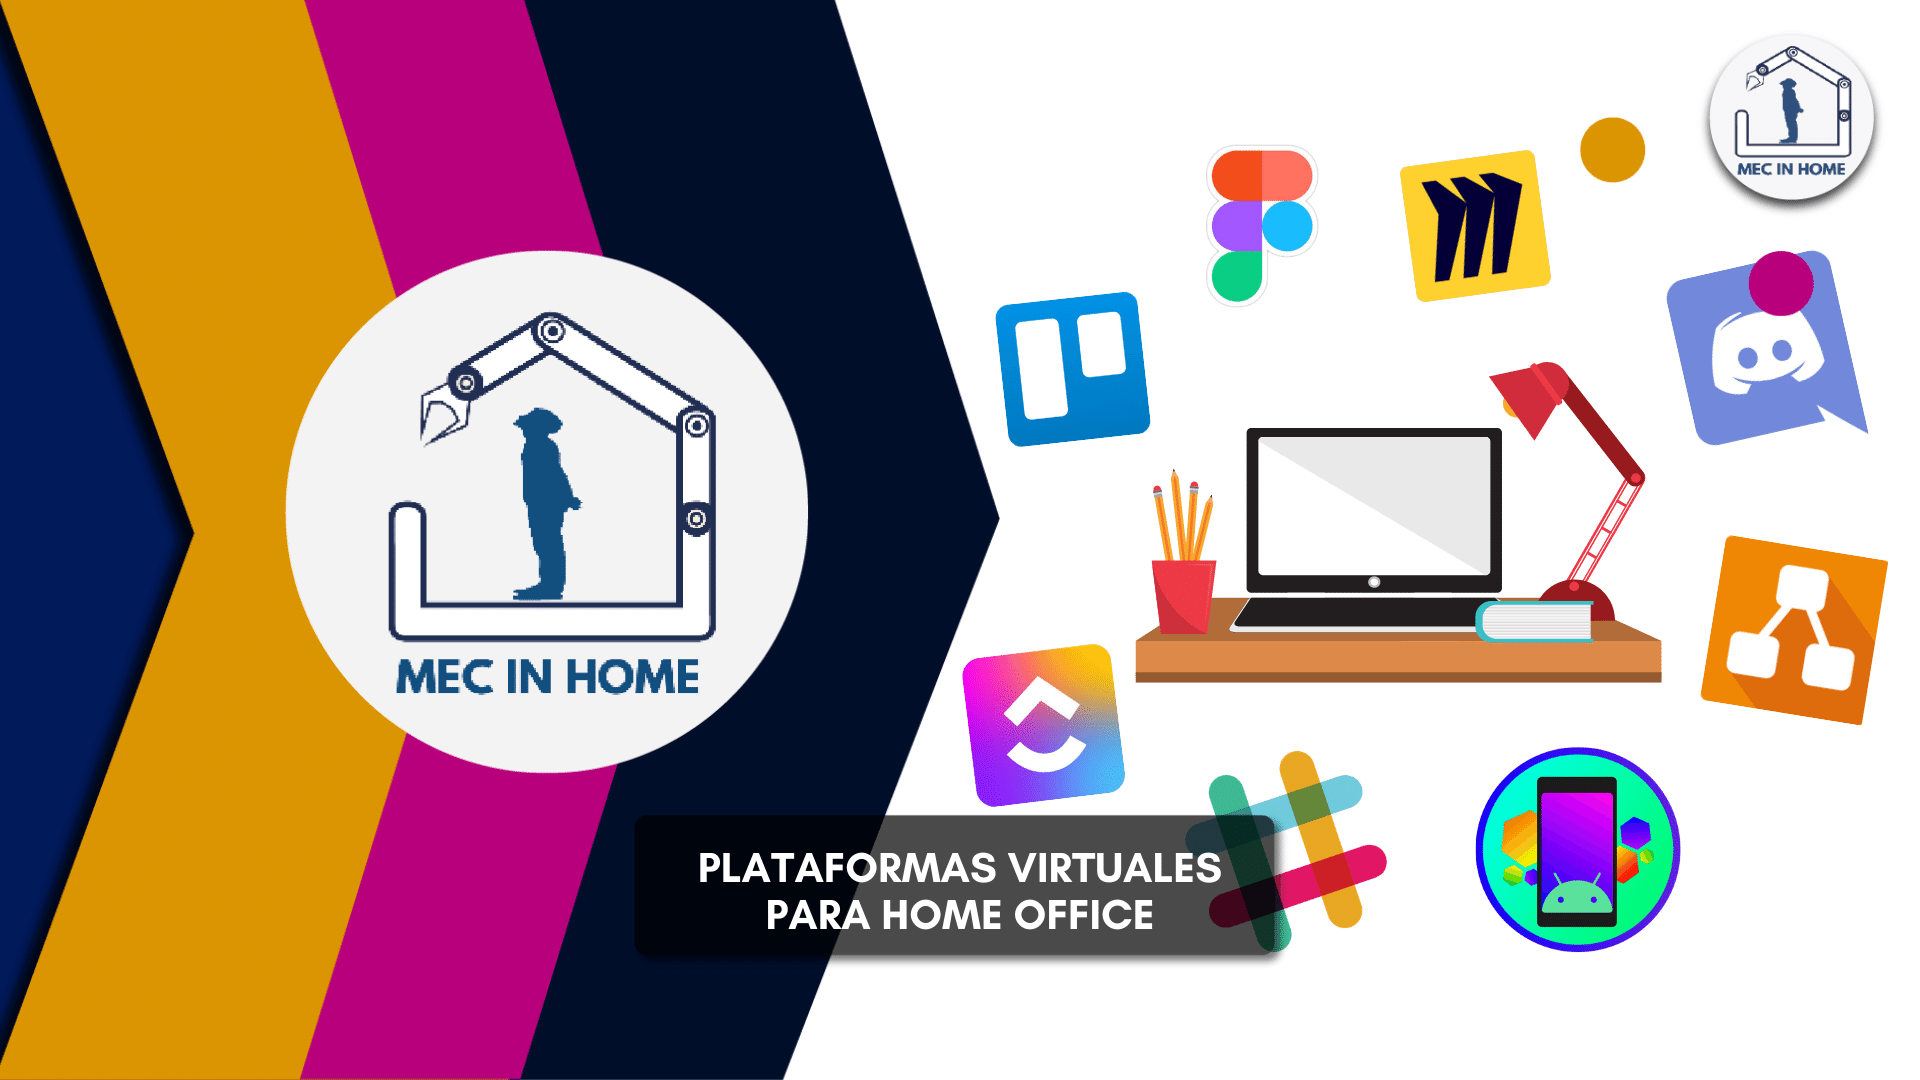 plataformas virtuales para home office